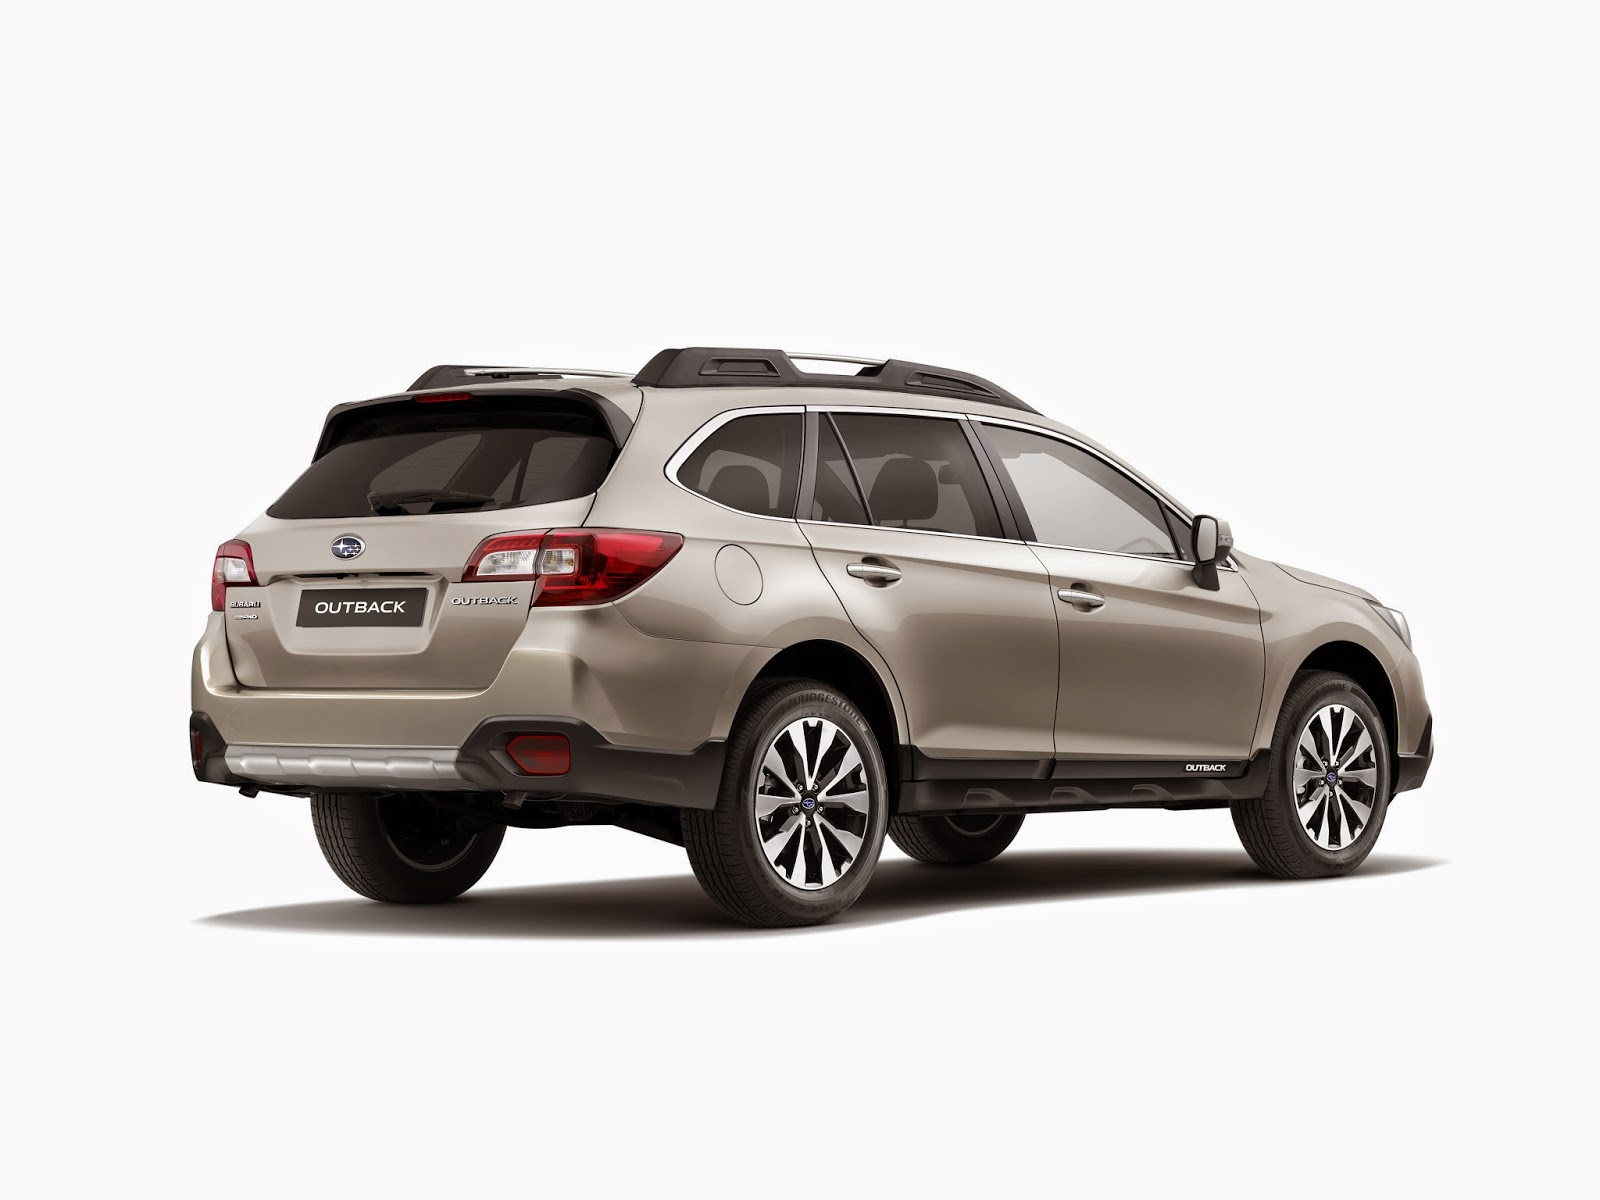 2015-2016 Subaru Outback в России